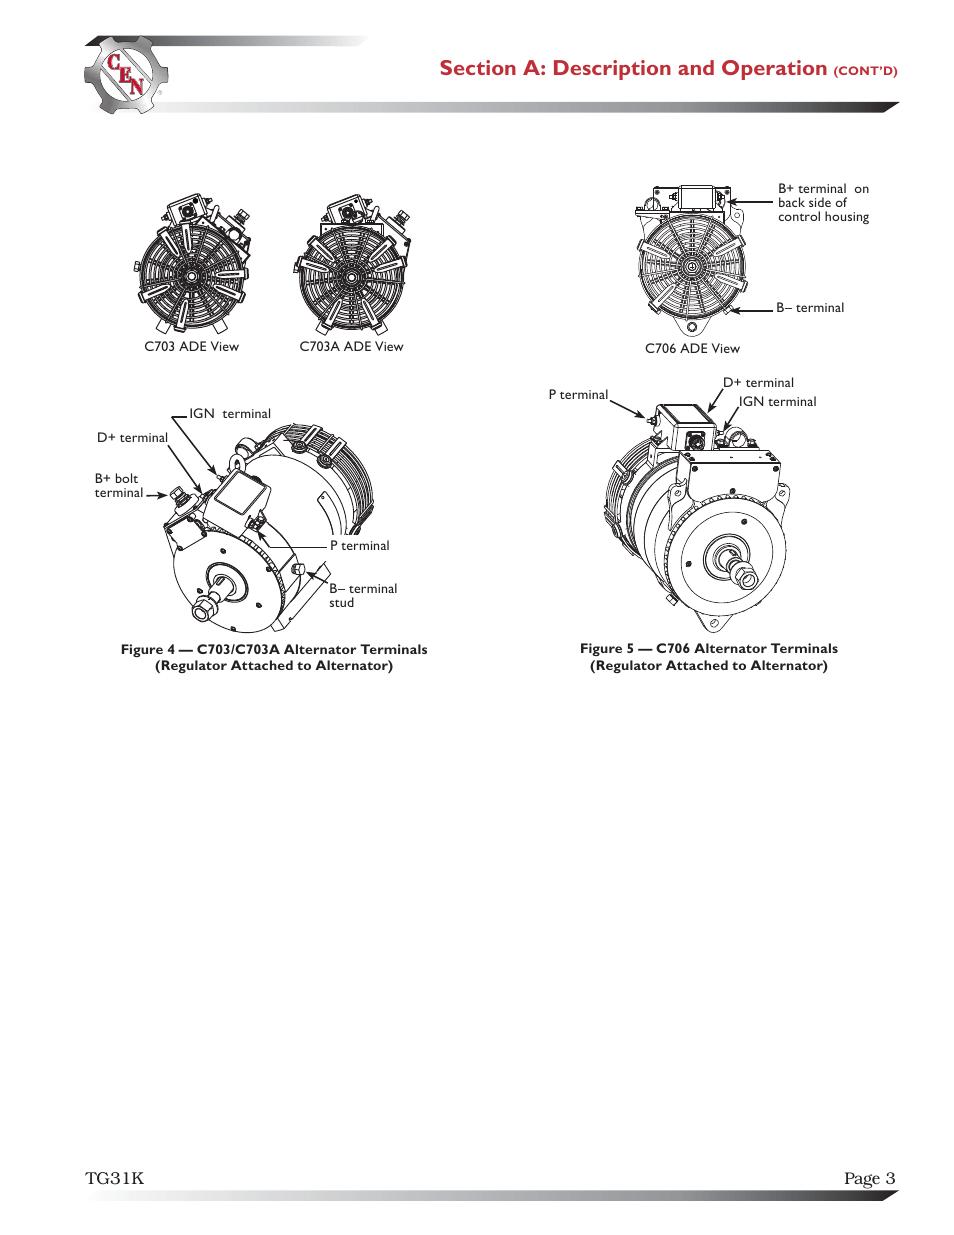 C.E. Niehoff & Co. C703/C703A & C706 Troubleshooting